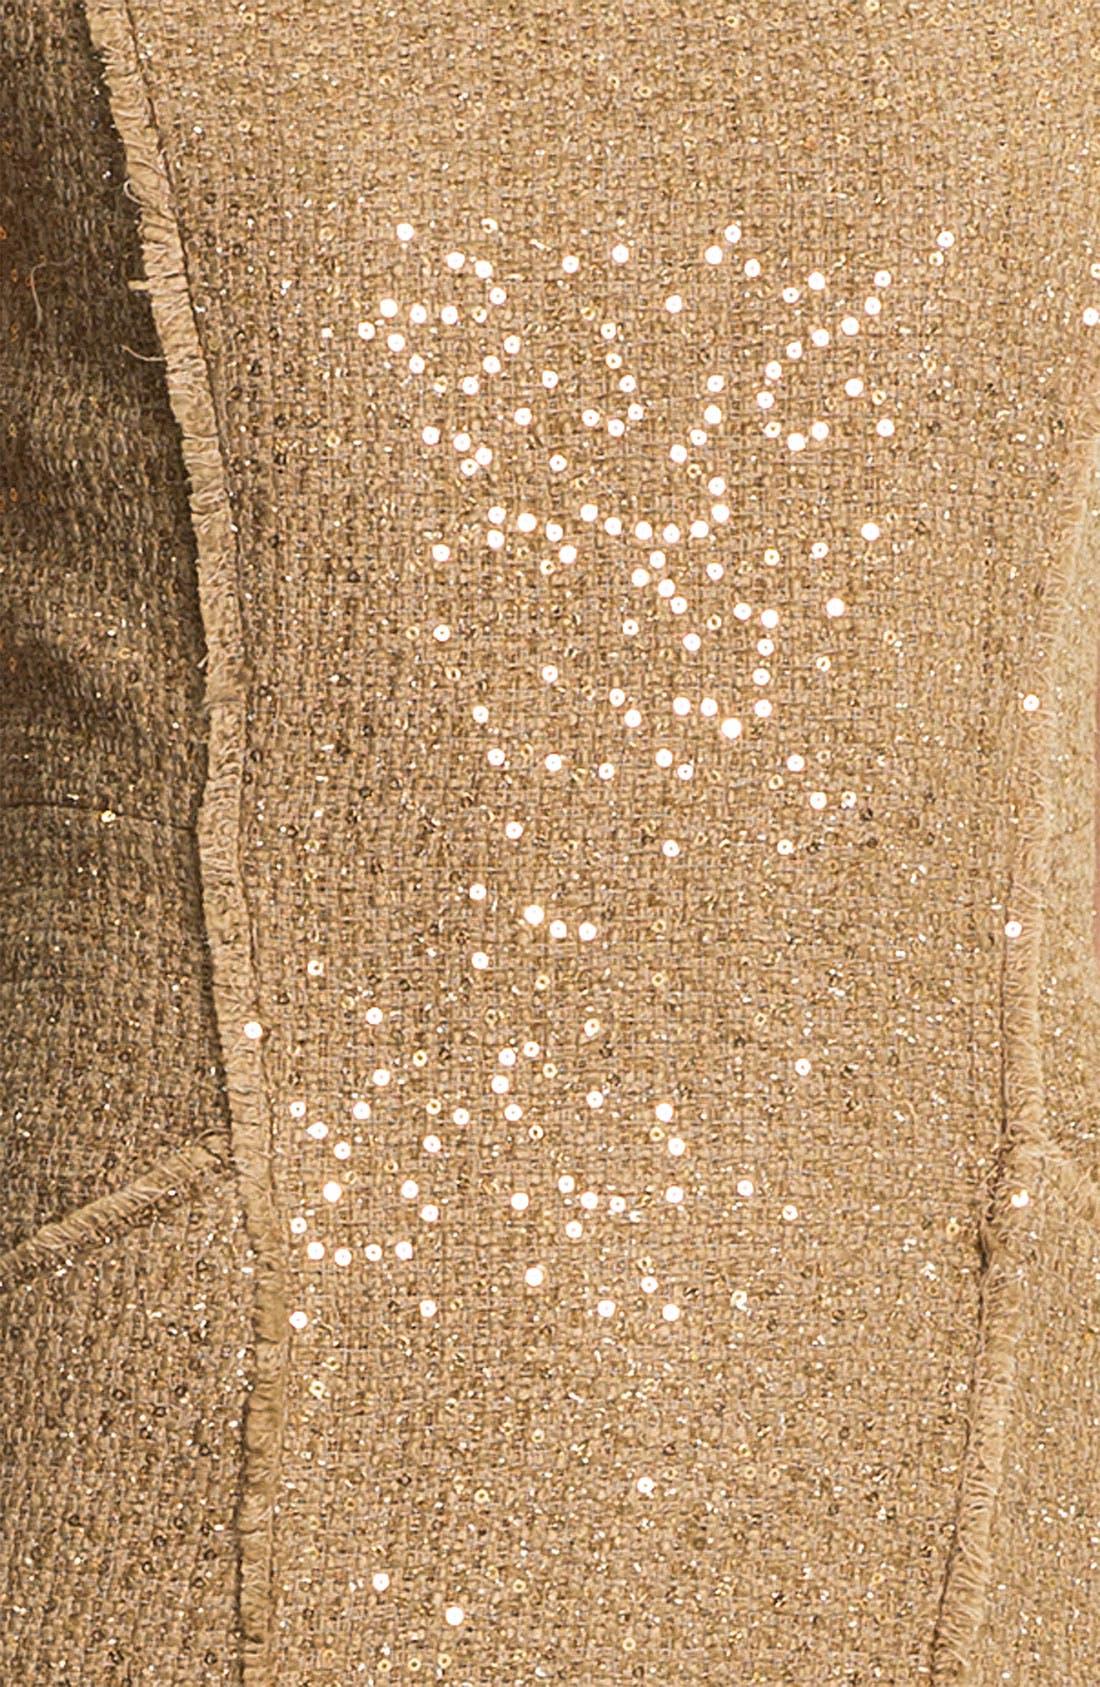 Alternate Image 3  - MICHAEL Michael Kors Fray Edge Sheath Dress (Petite)